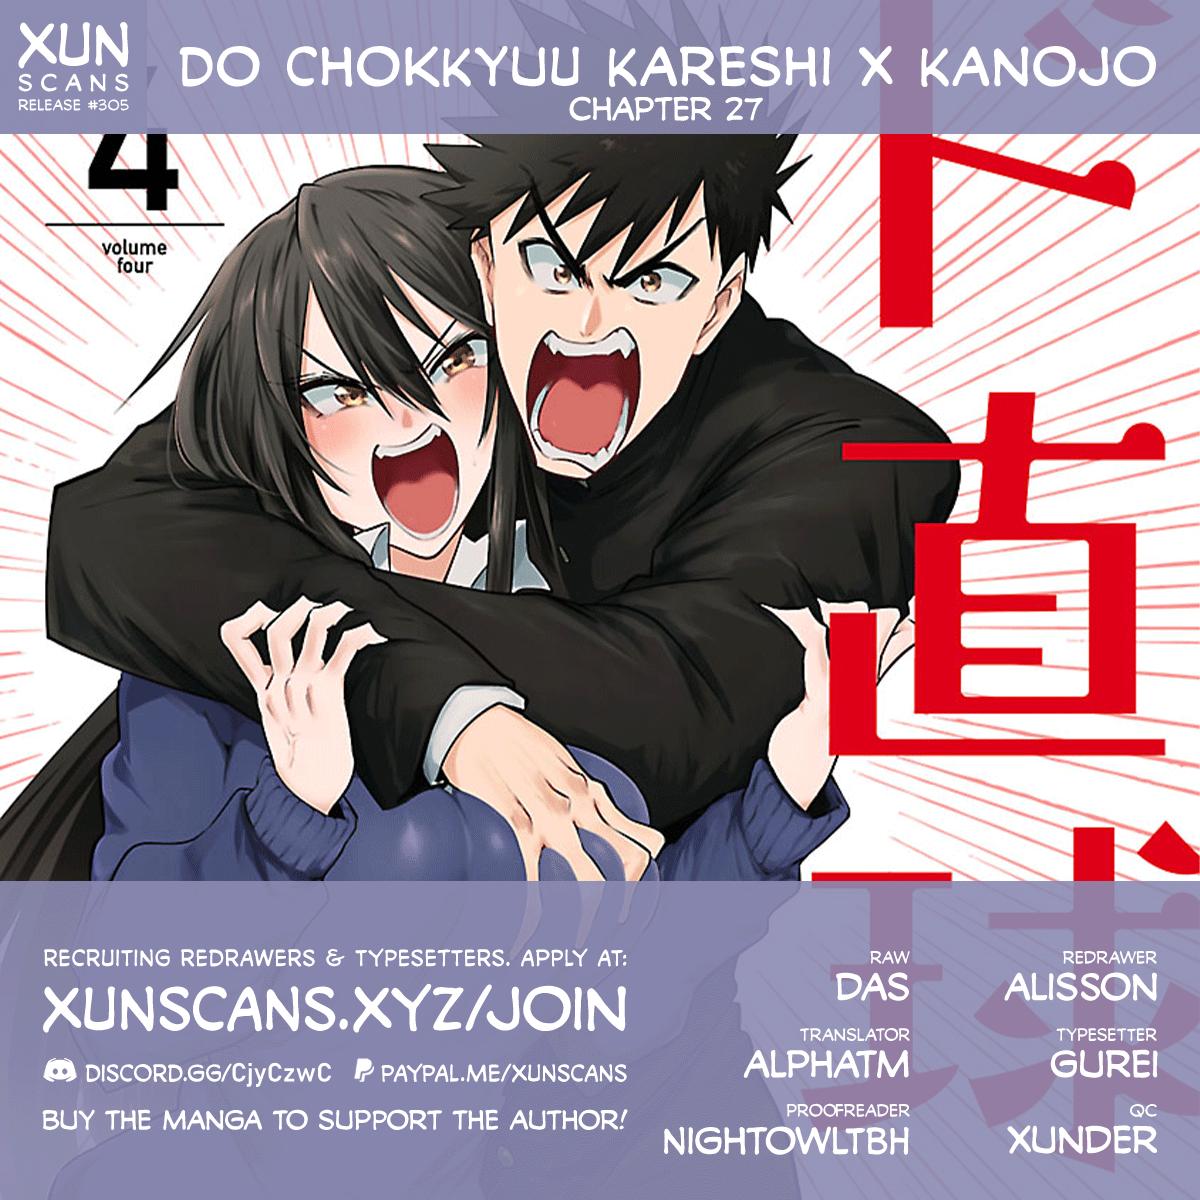 Manga Do Chokkyuu Kareshi x Kanojo - Chapter 27 Page 1